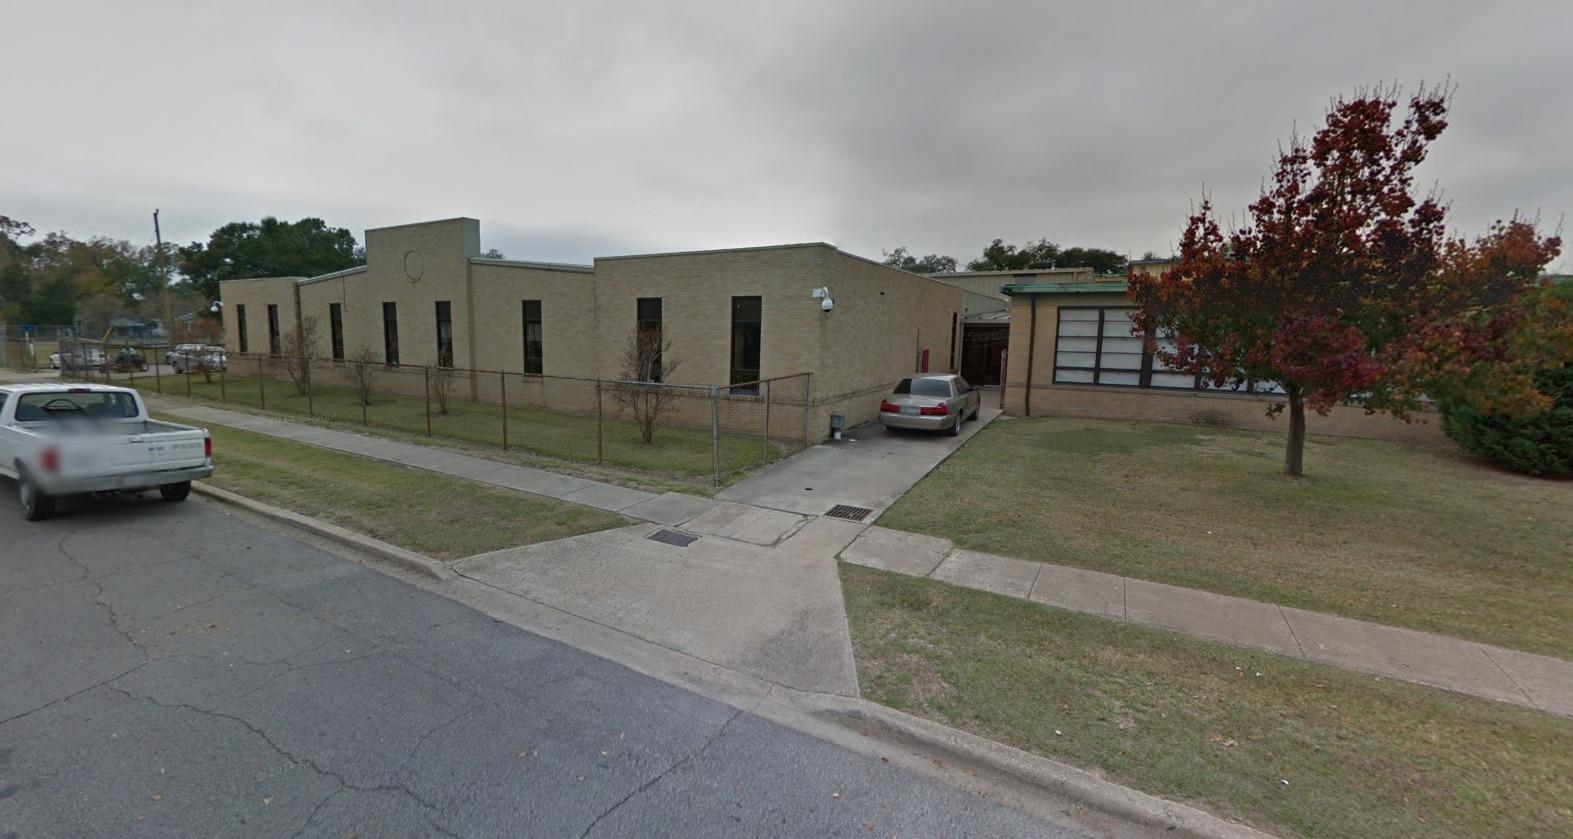 Beaumont ISD's Pathways Alternative Learning Center